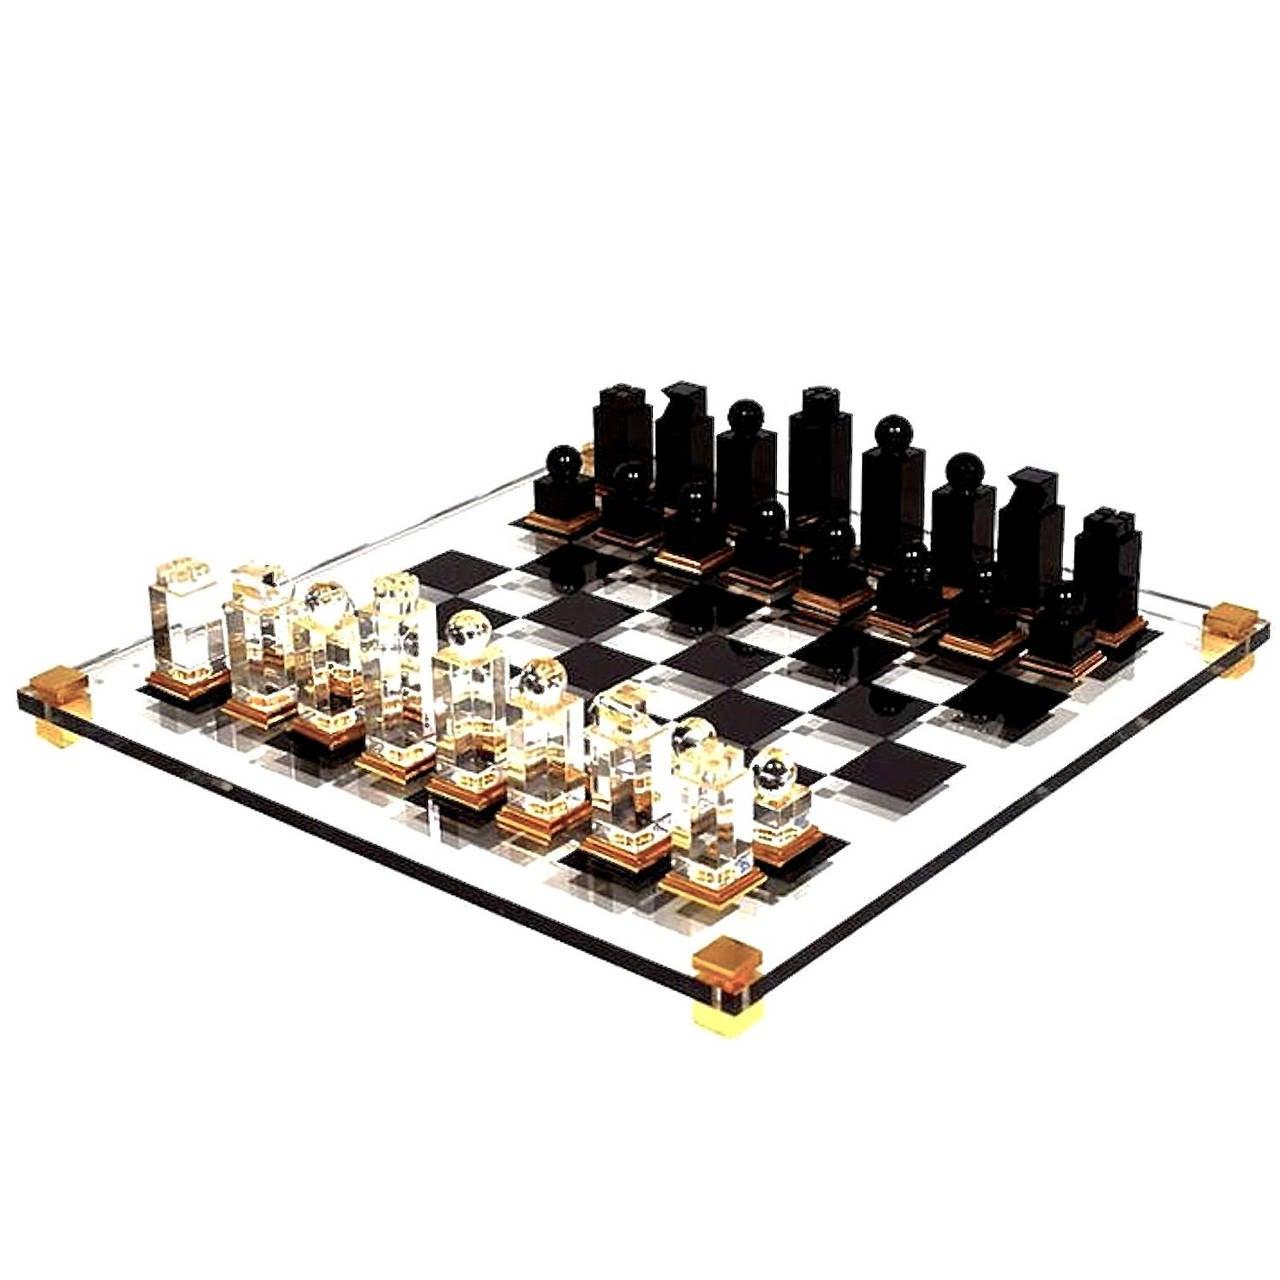 Michel Dumas Lucite Chess Set At 1stdibs